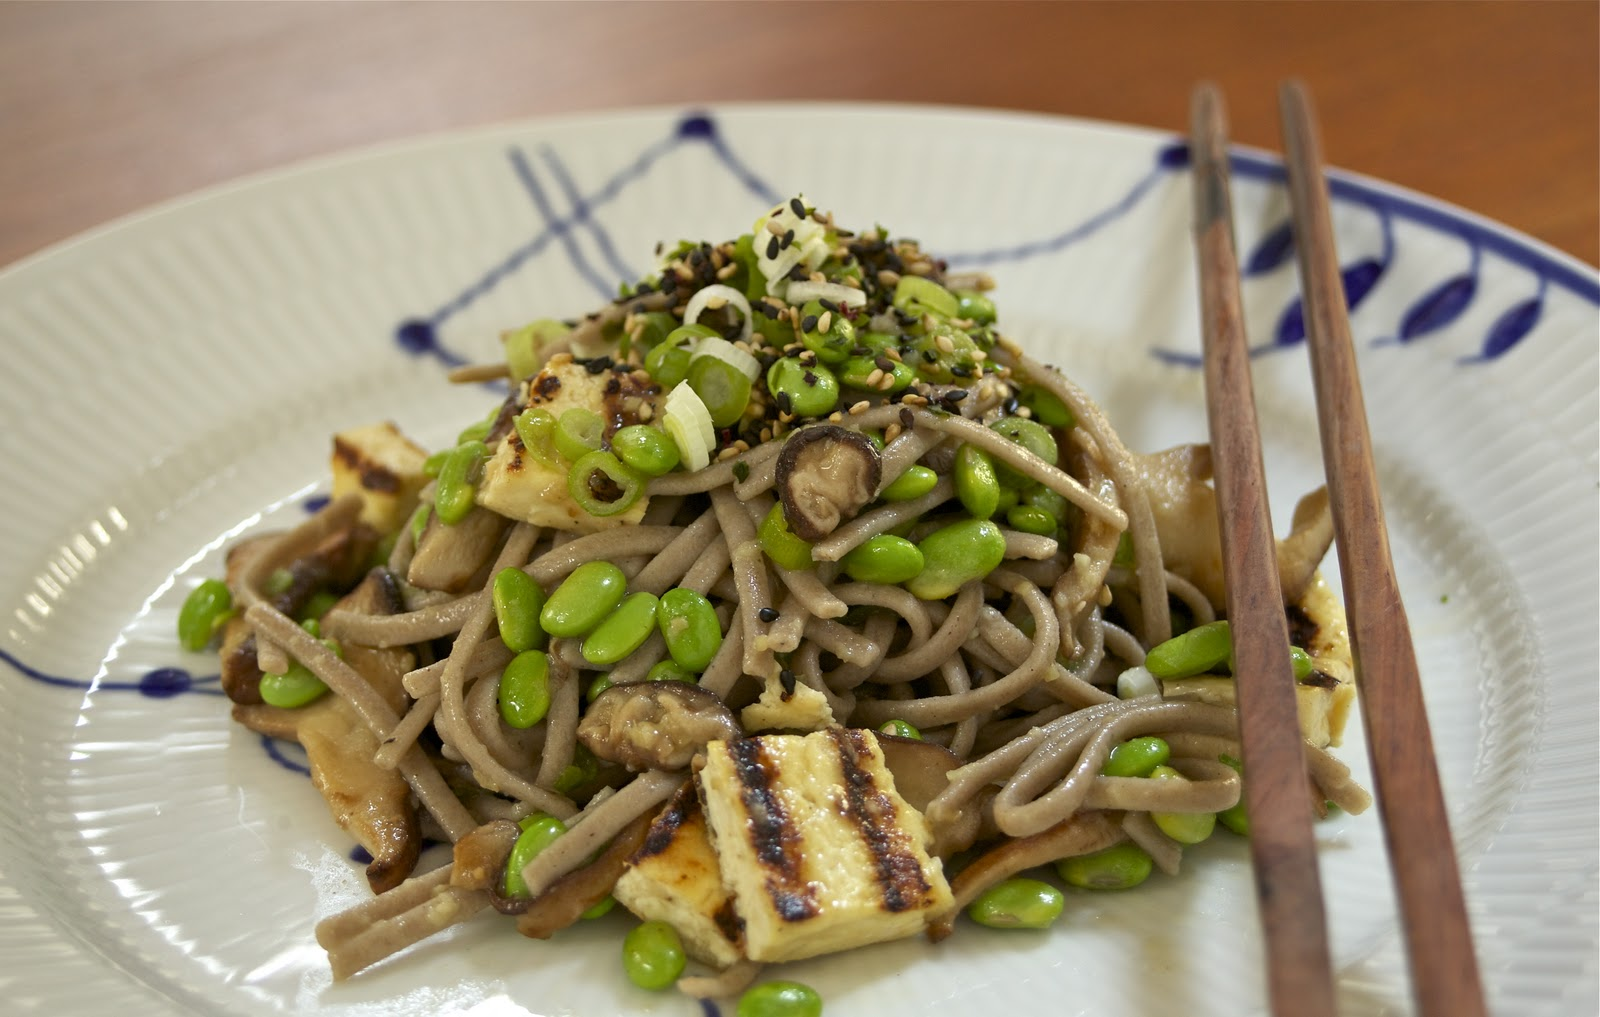 ... life: Lunch/Dinner Recipe 5: Japanese Inspired Soba Noodle Salad